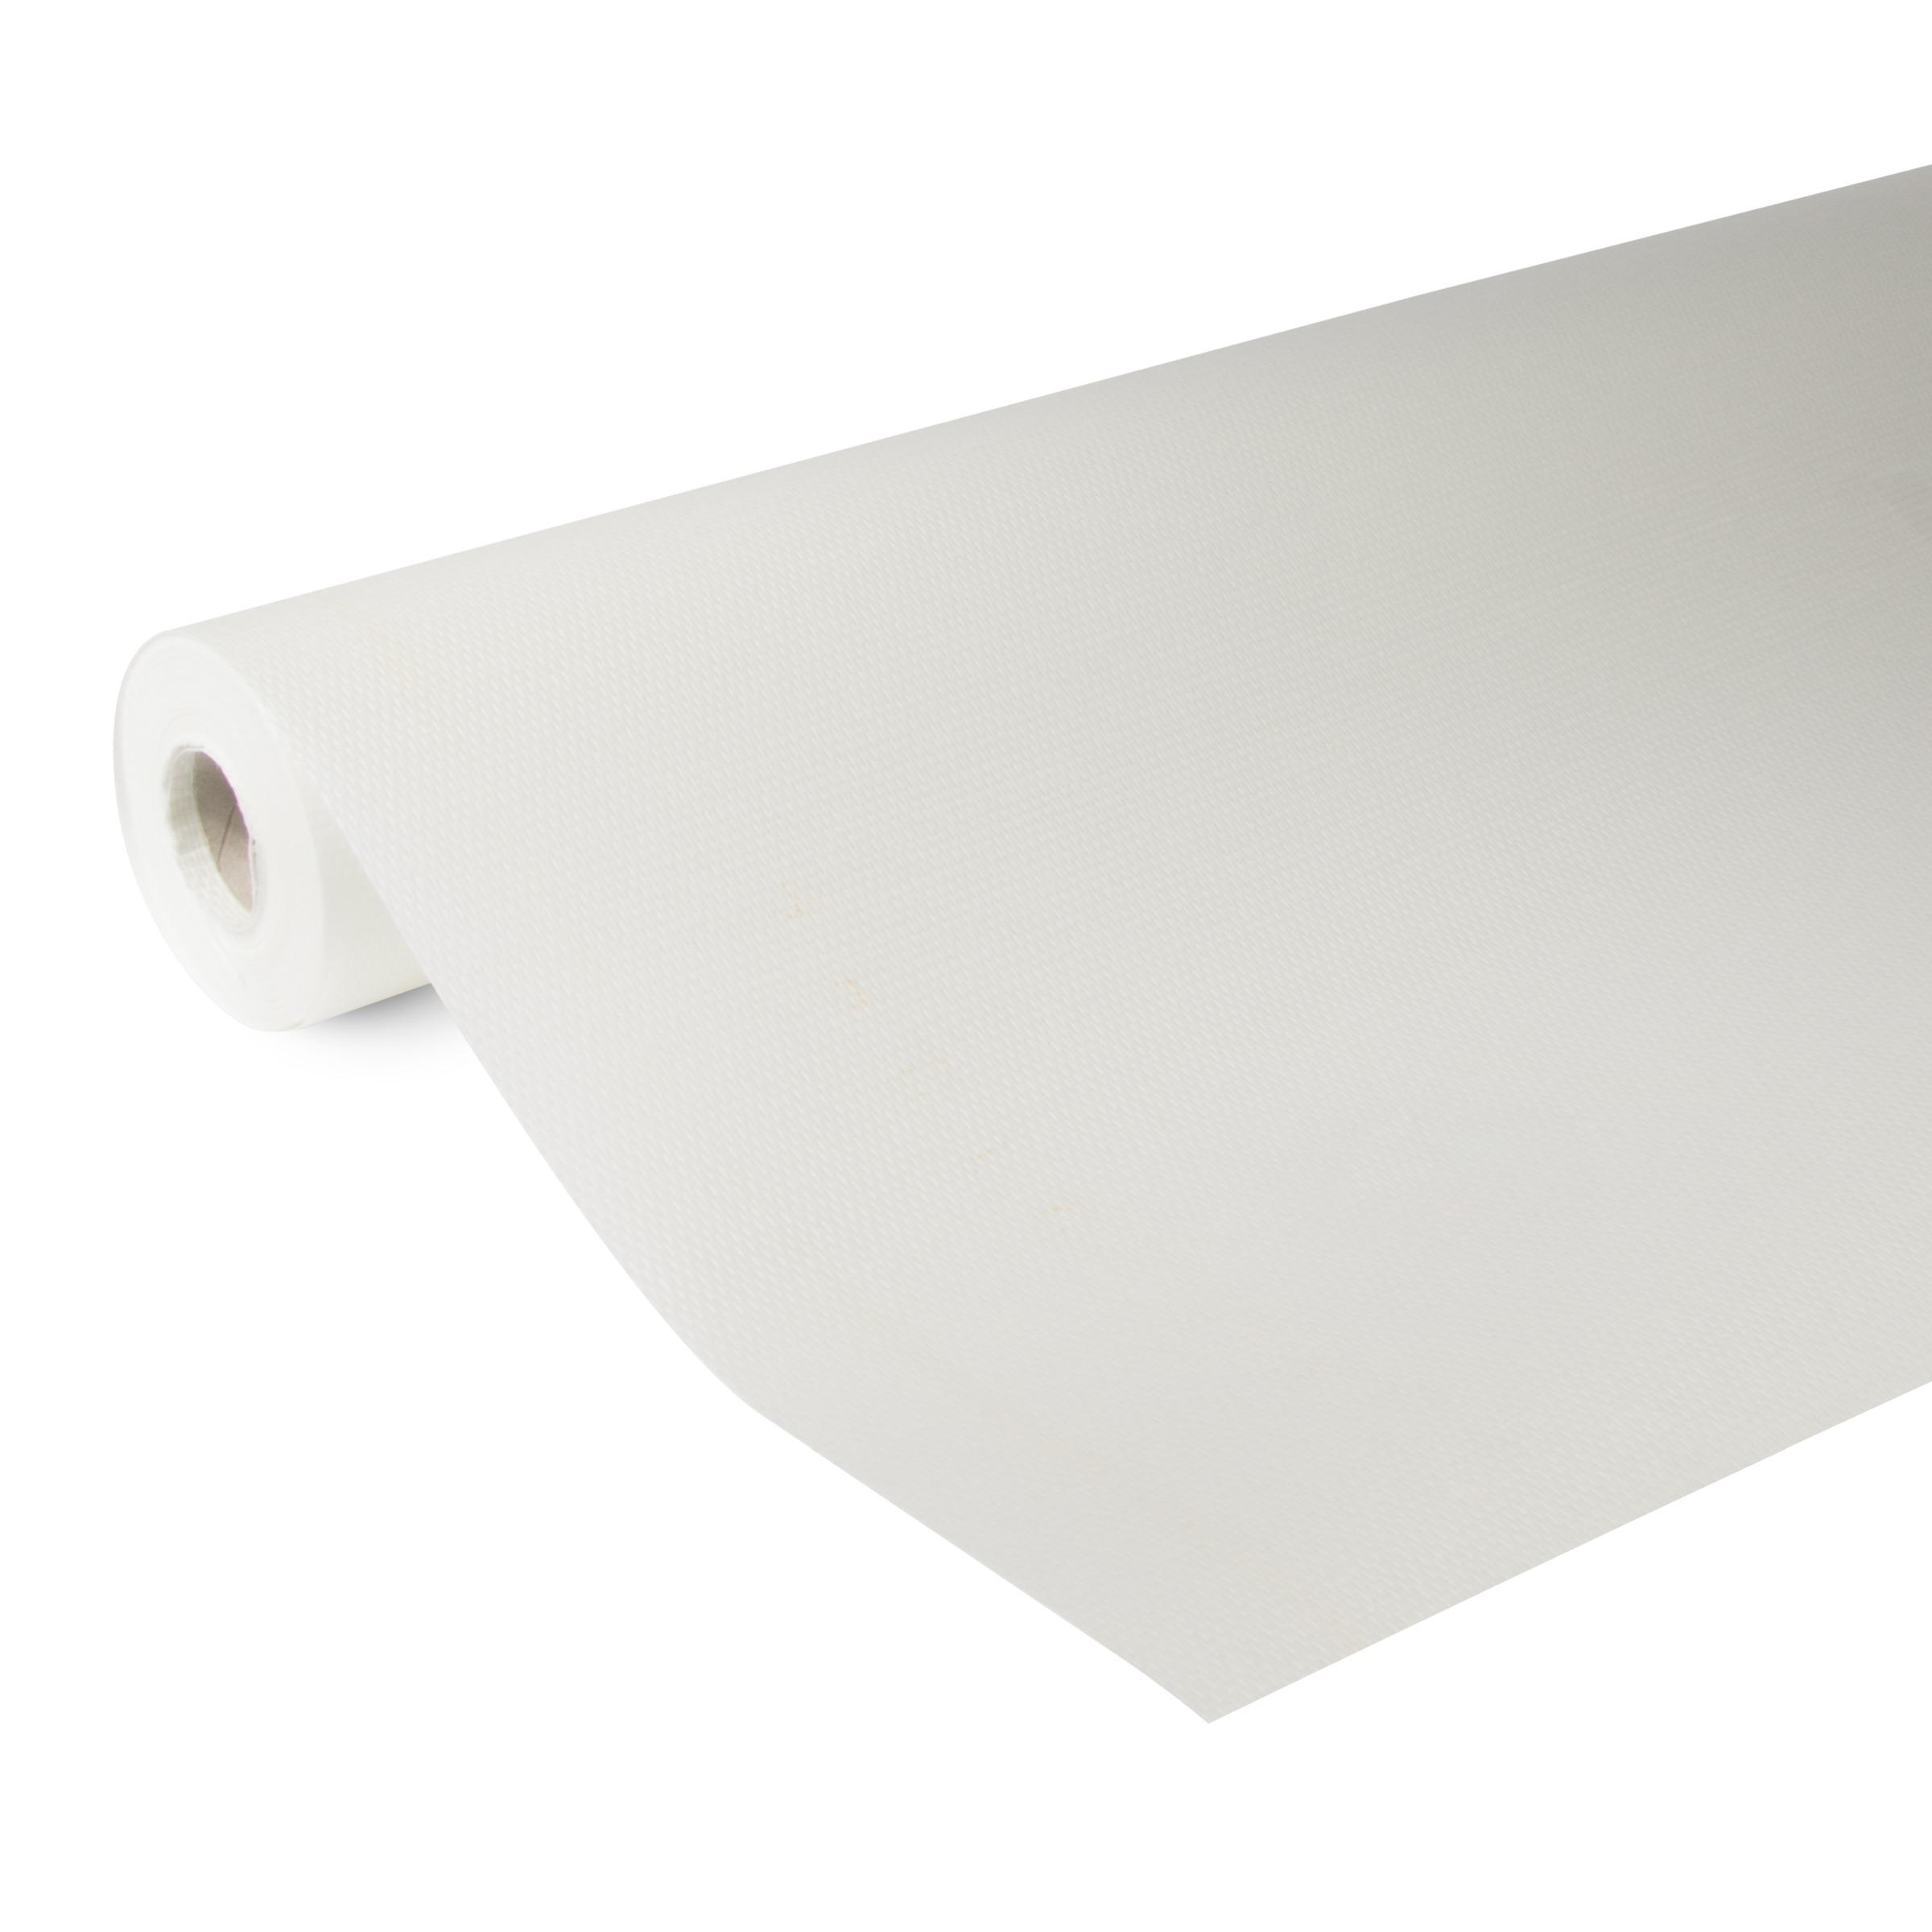 Glasweefselbehang ruit fijn standaard wit 25 m (dessin GW100-25)